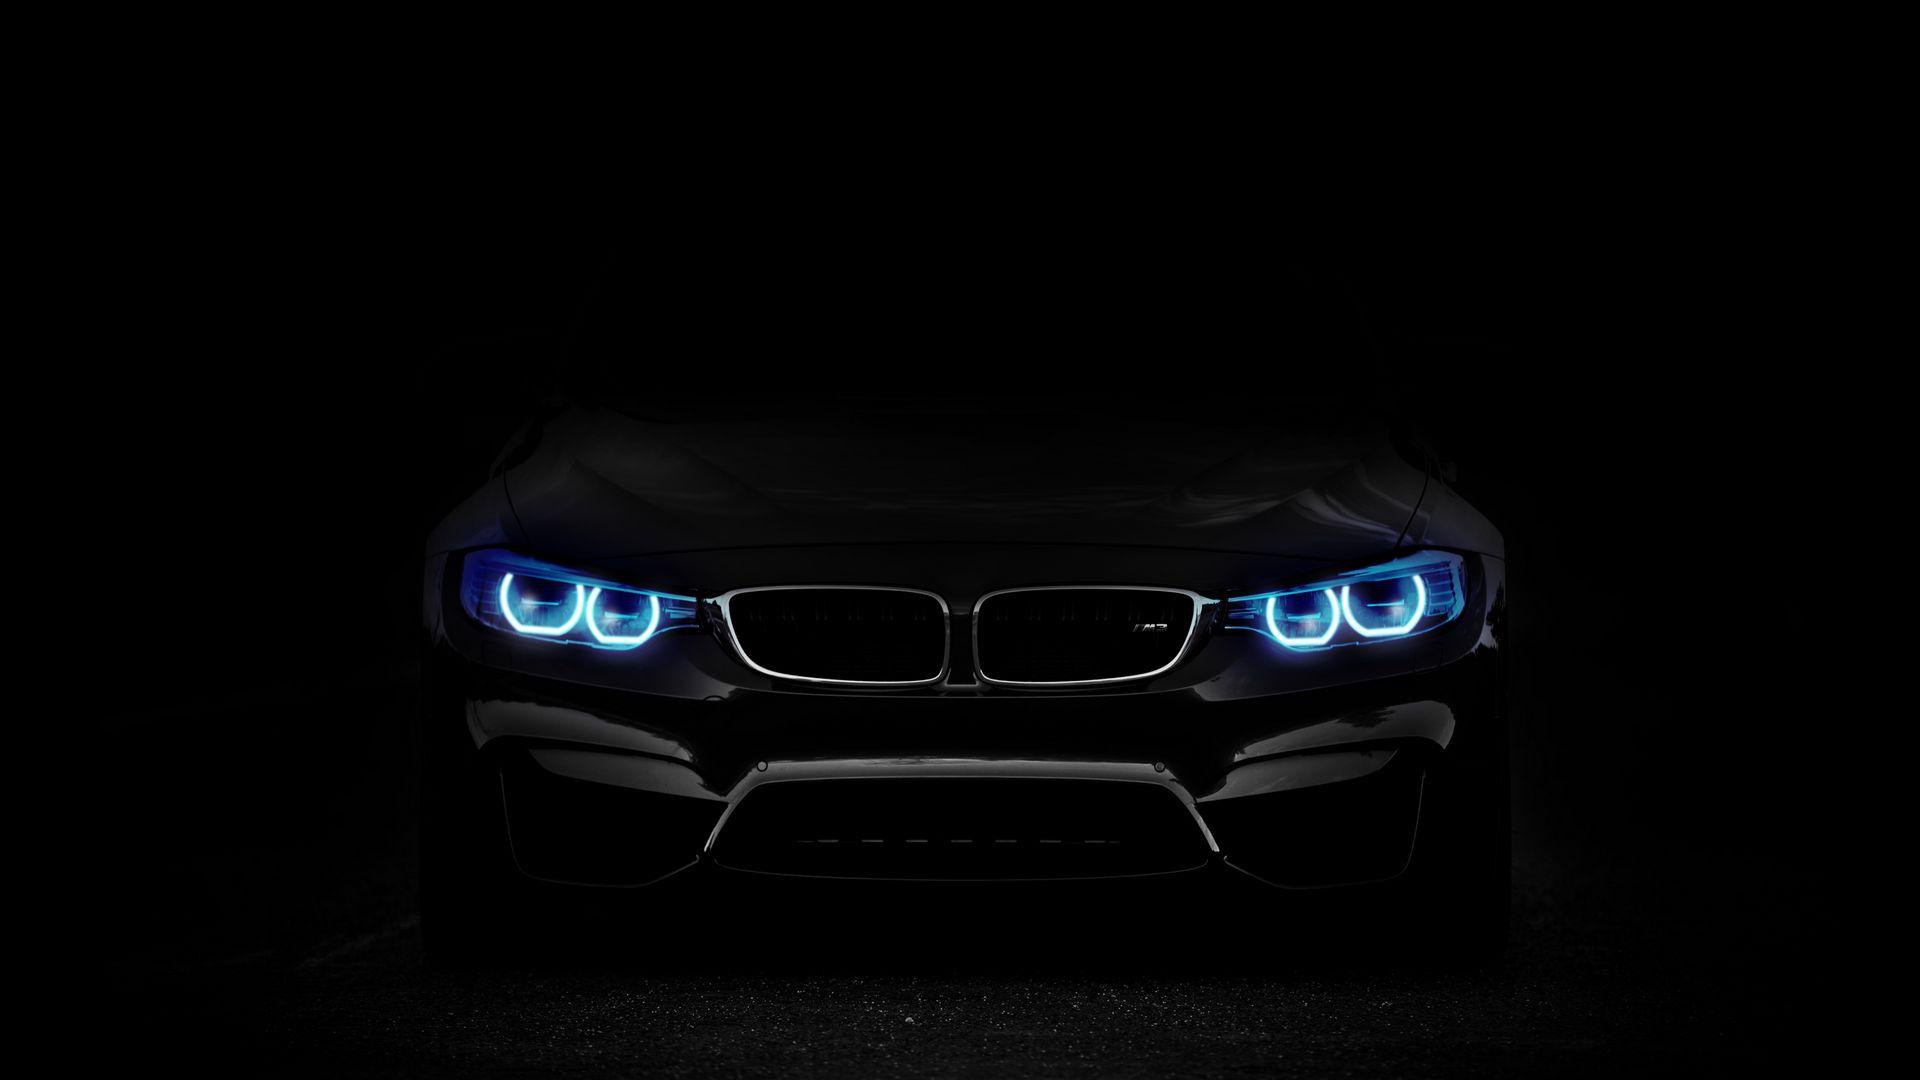 Download wallpaper 1920x1080 bmw, headlights, lights, car ...